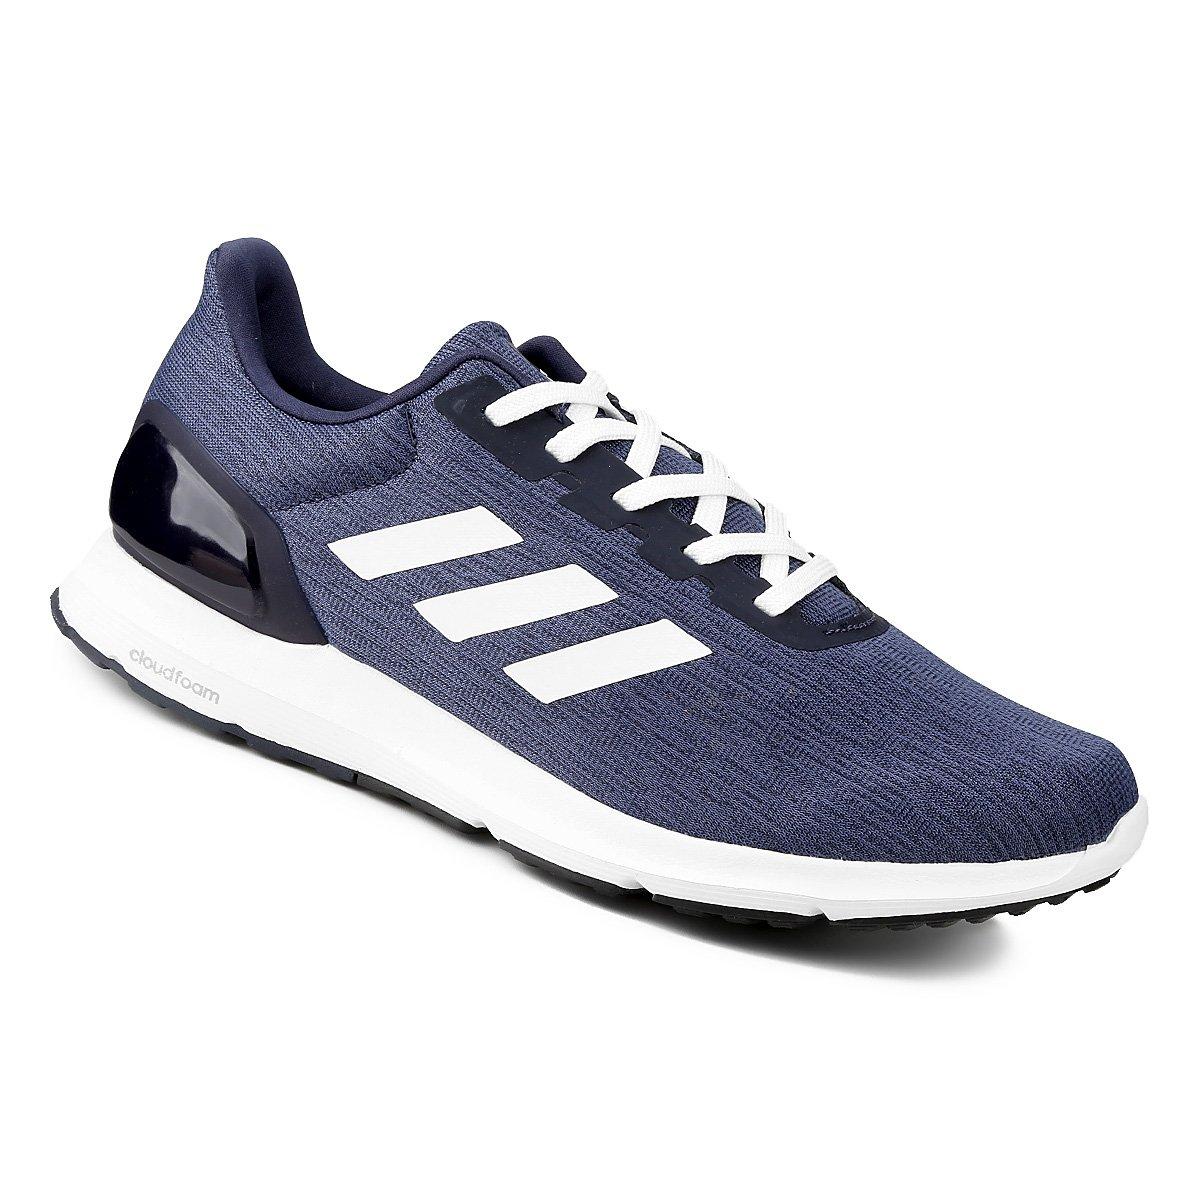 b236af25c5 Tenis Adidas Cosmic 2 m